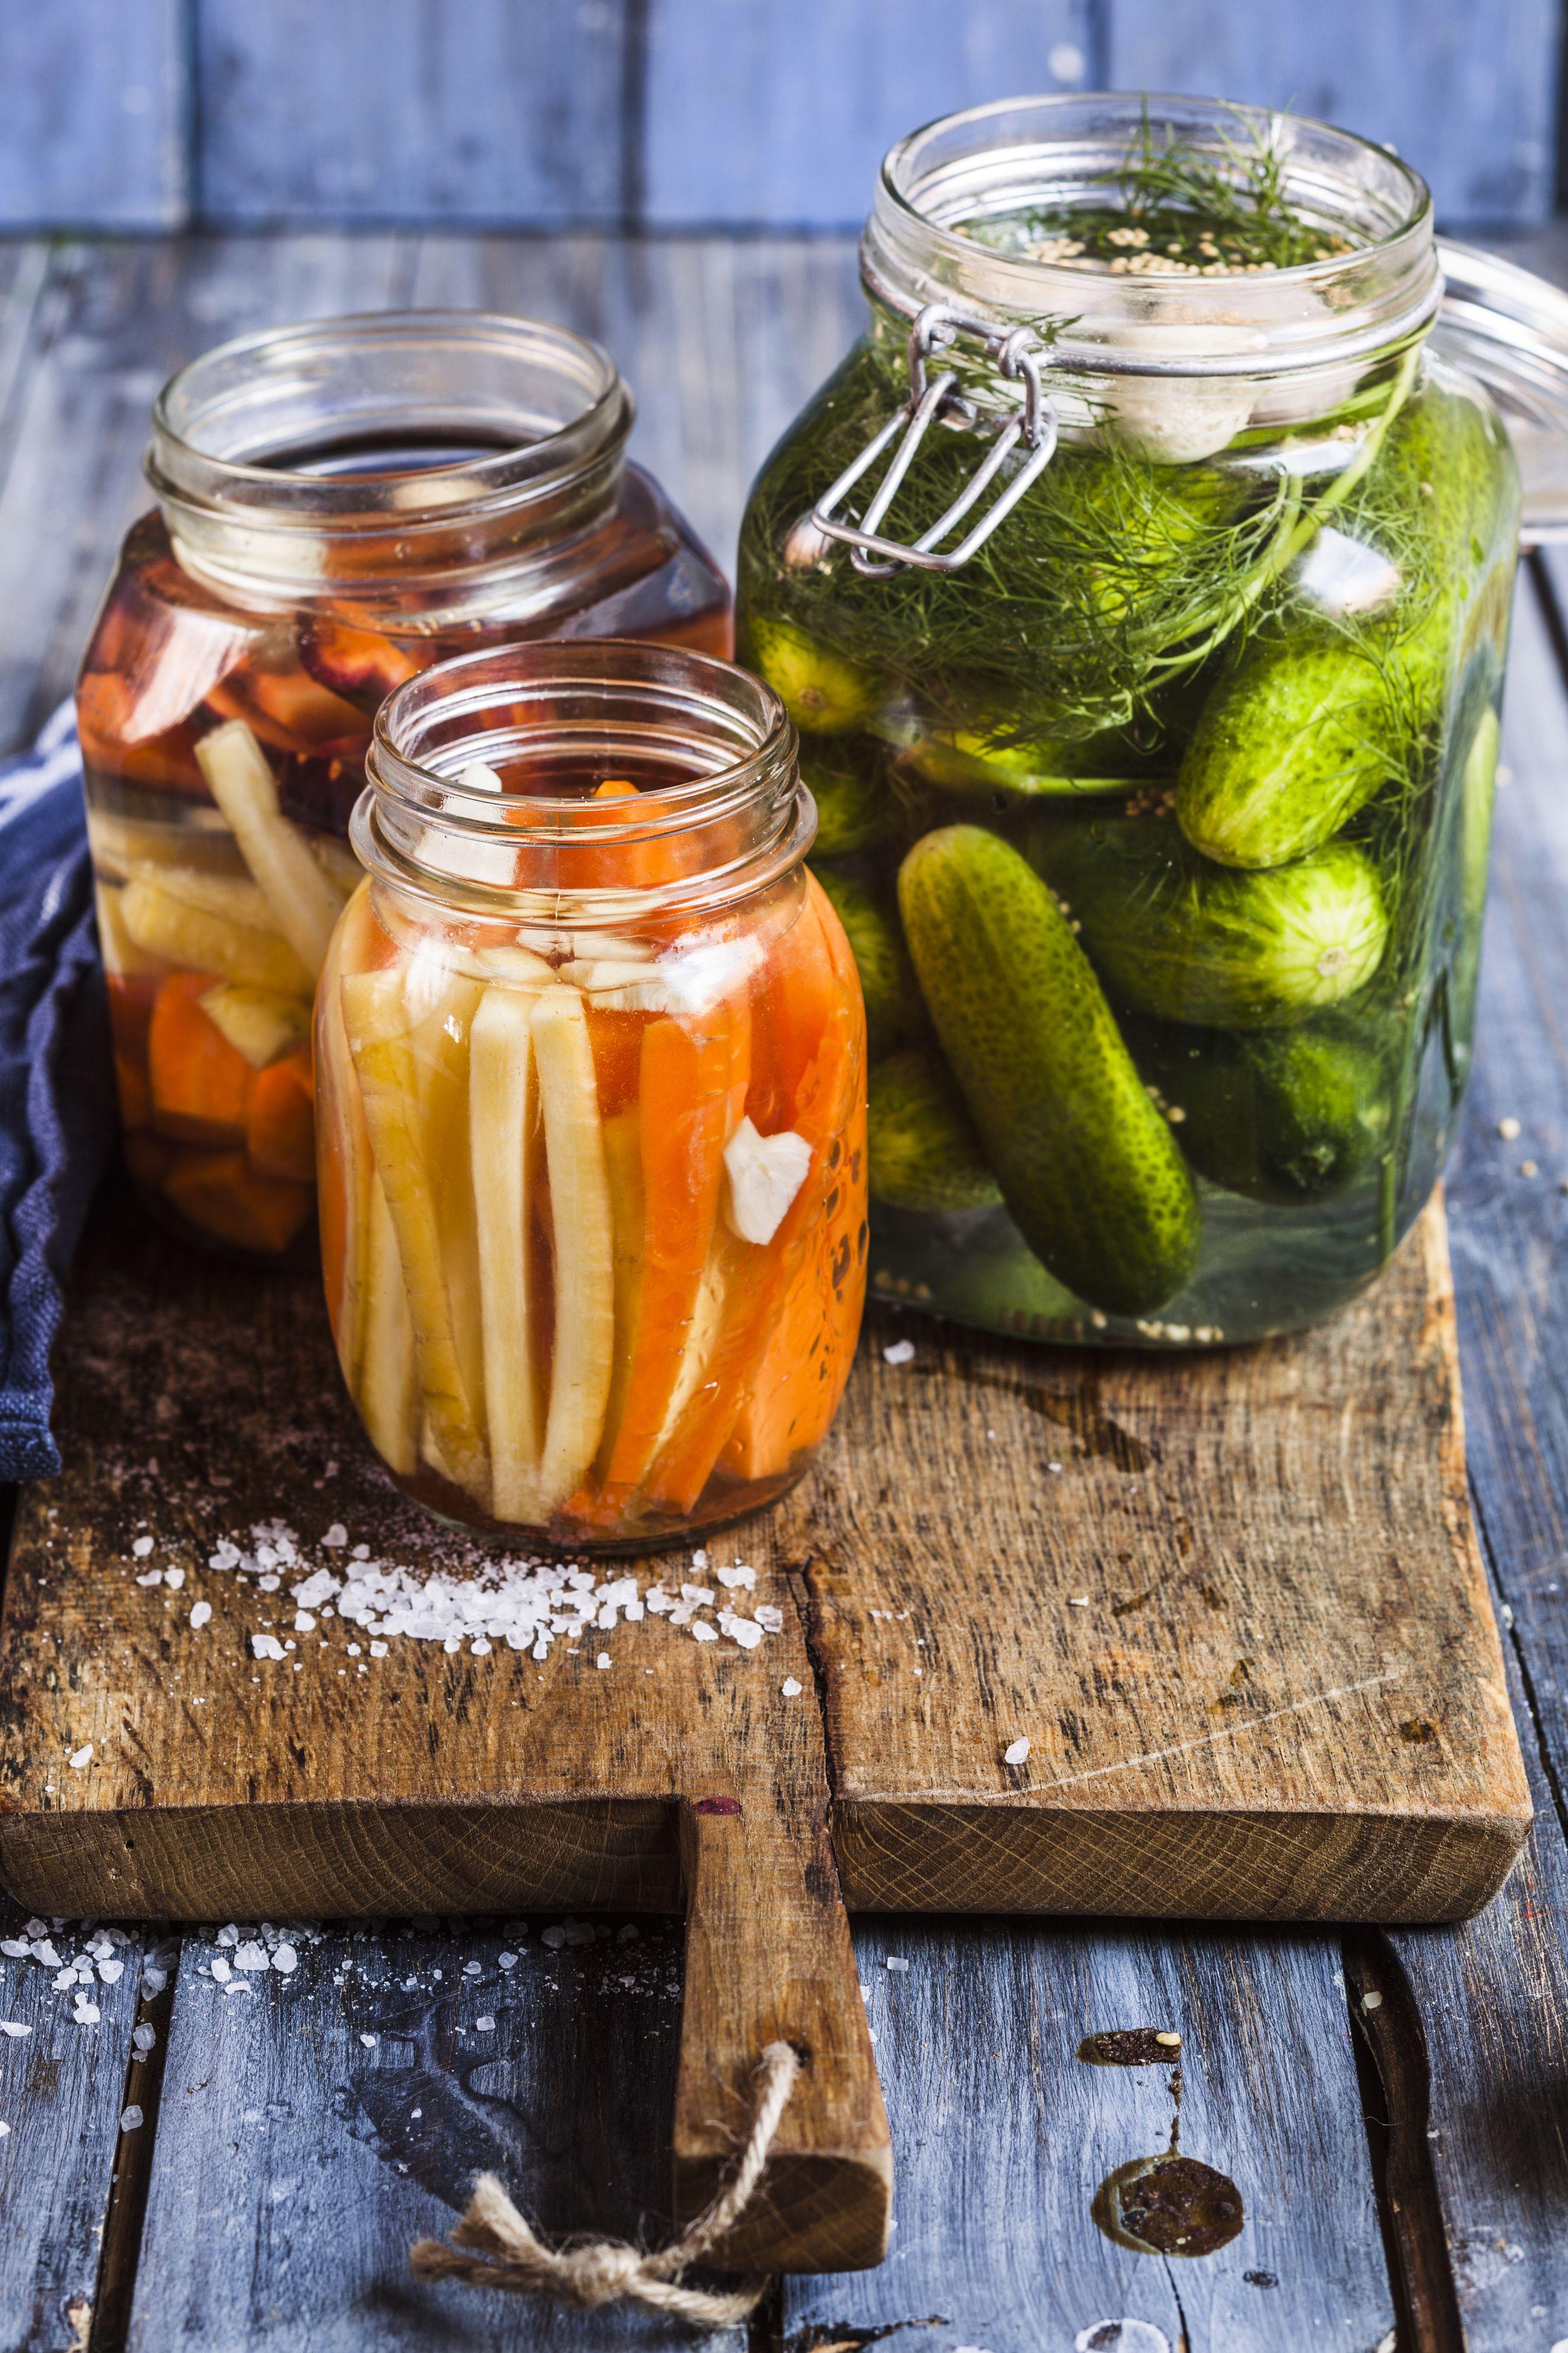 Gherkins fermenting, gherkins and carrots in preserving jars